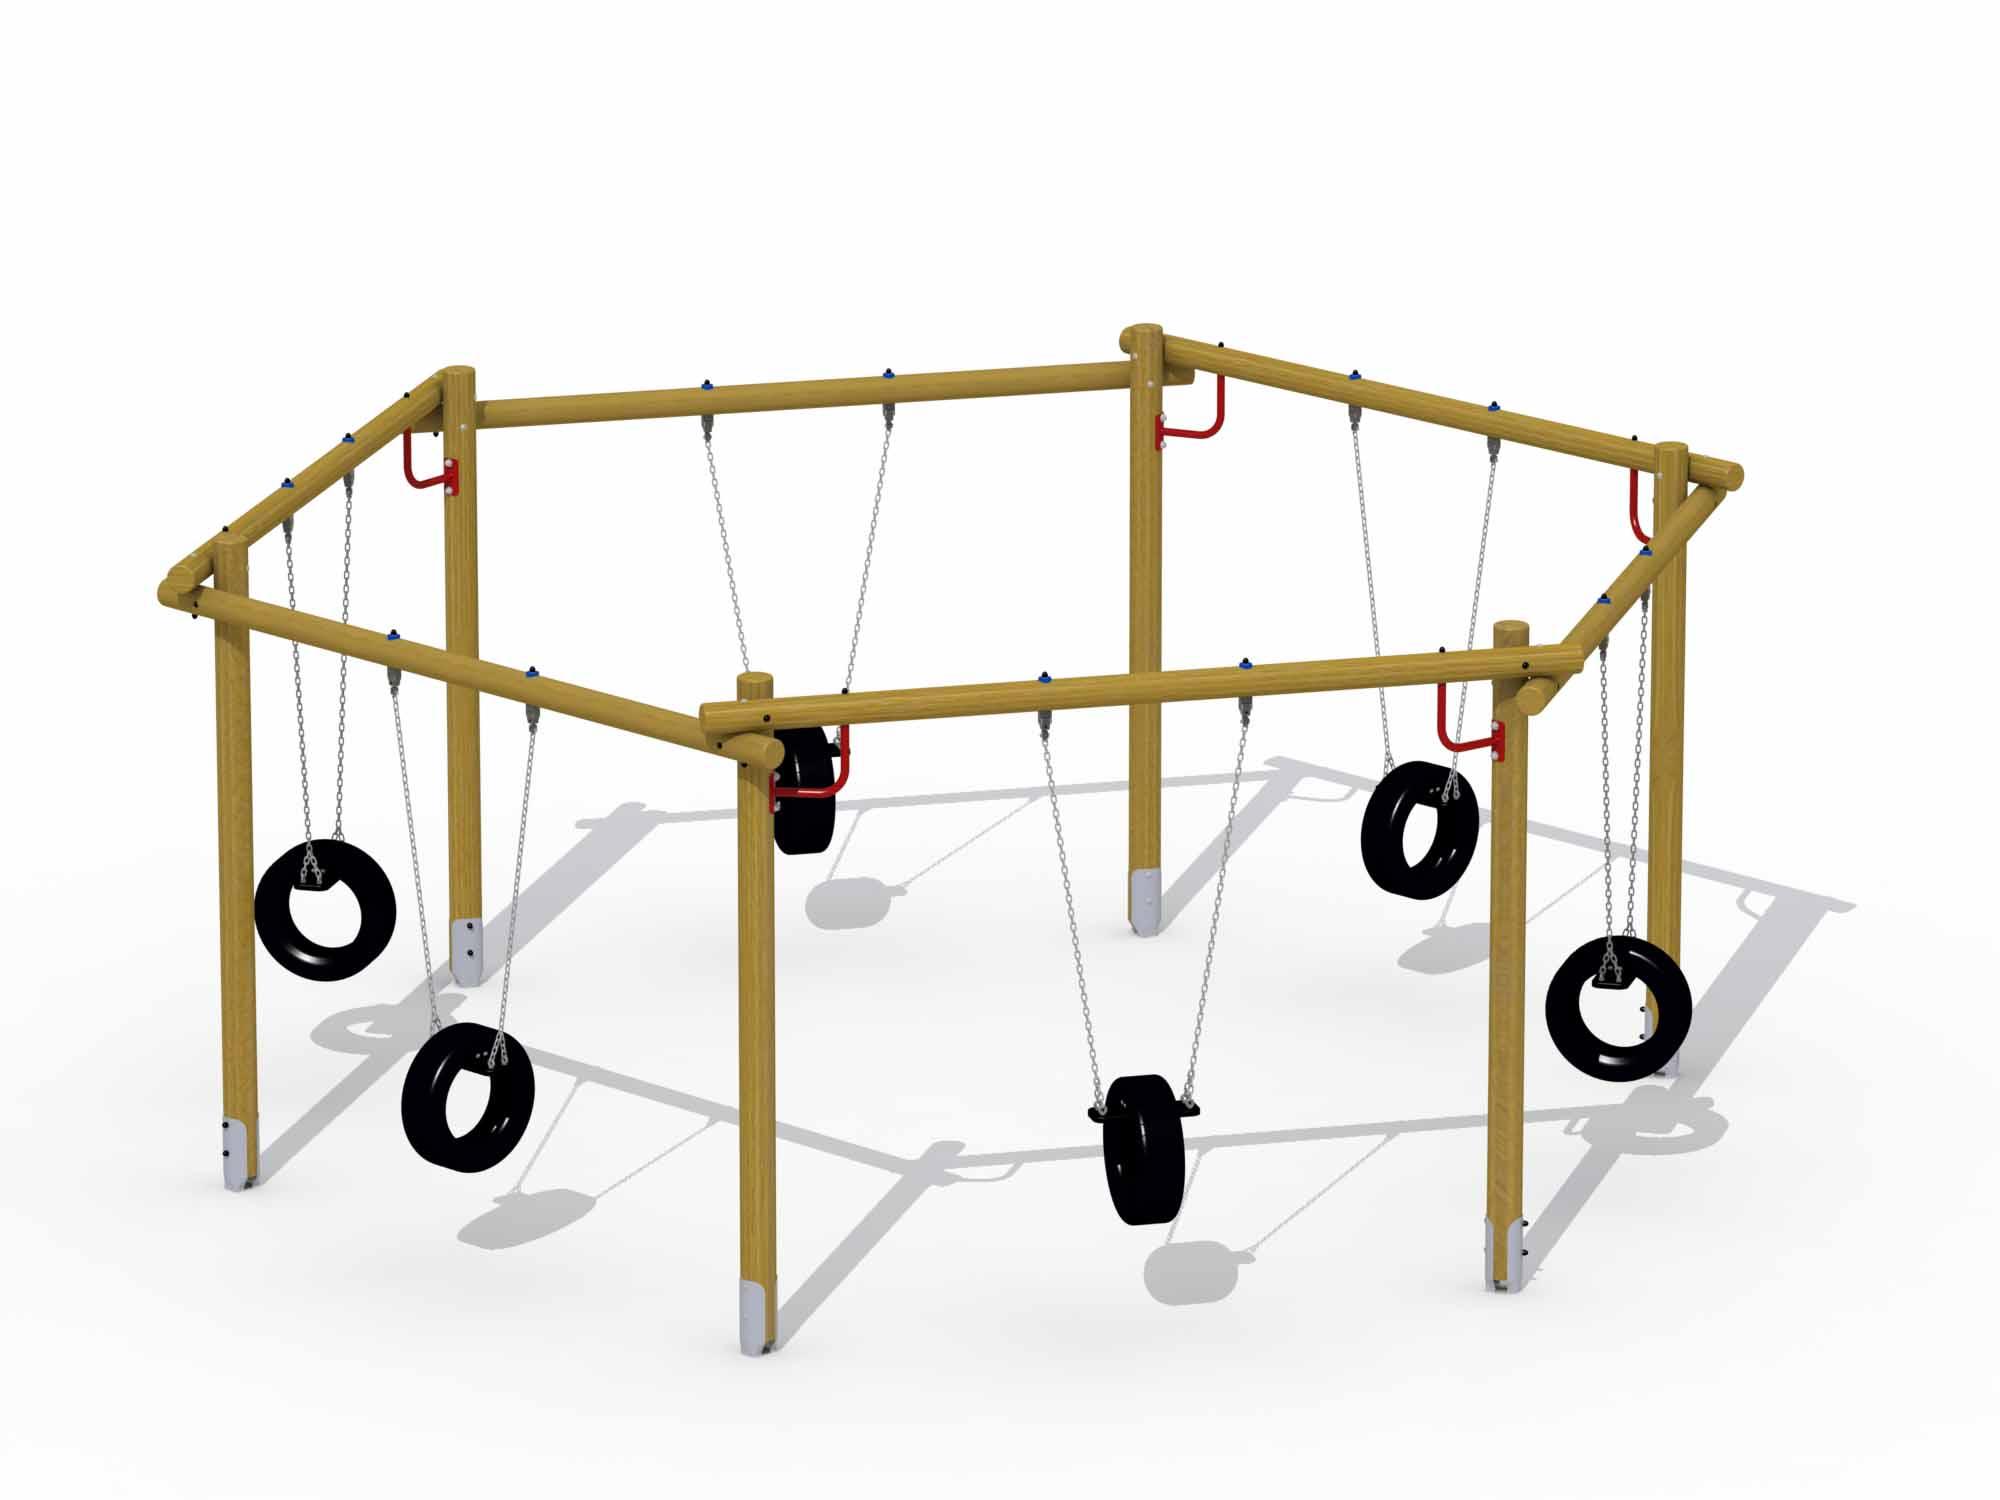 Hexagonal Swing (special Tire Seat)